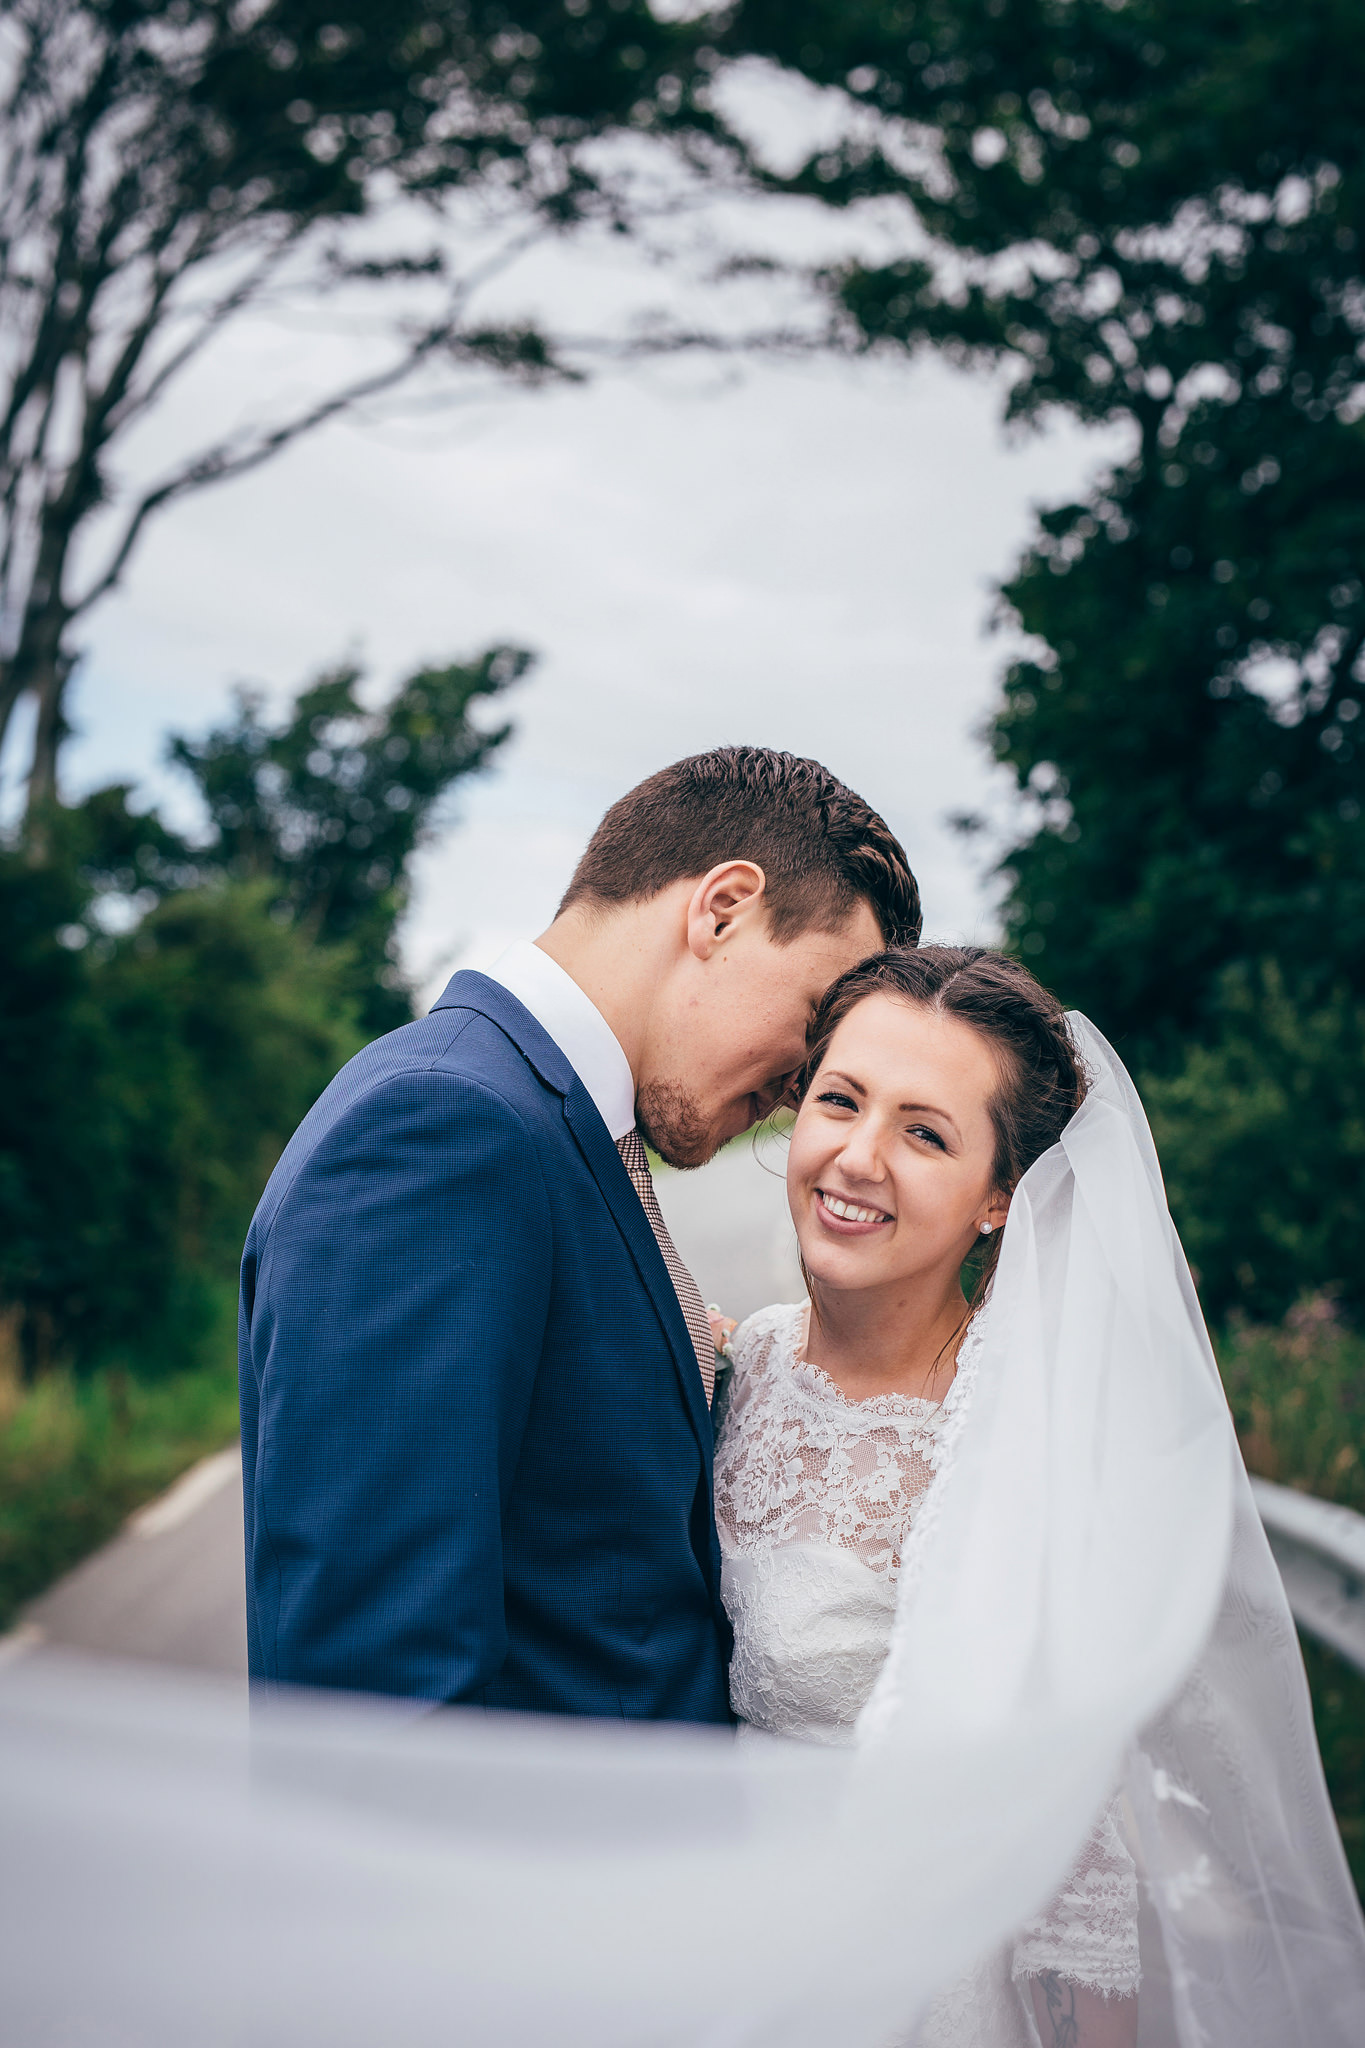 Norway+wedding+photographer+elopement+pre+wedding+Casey+Arneson-74.jpg